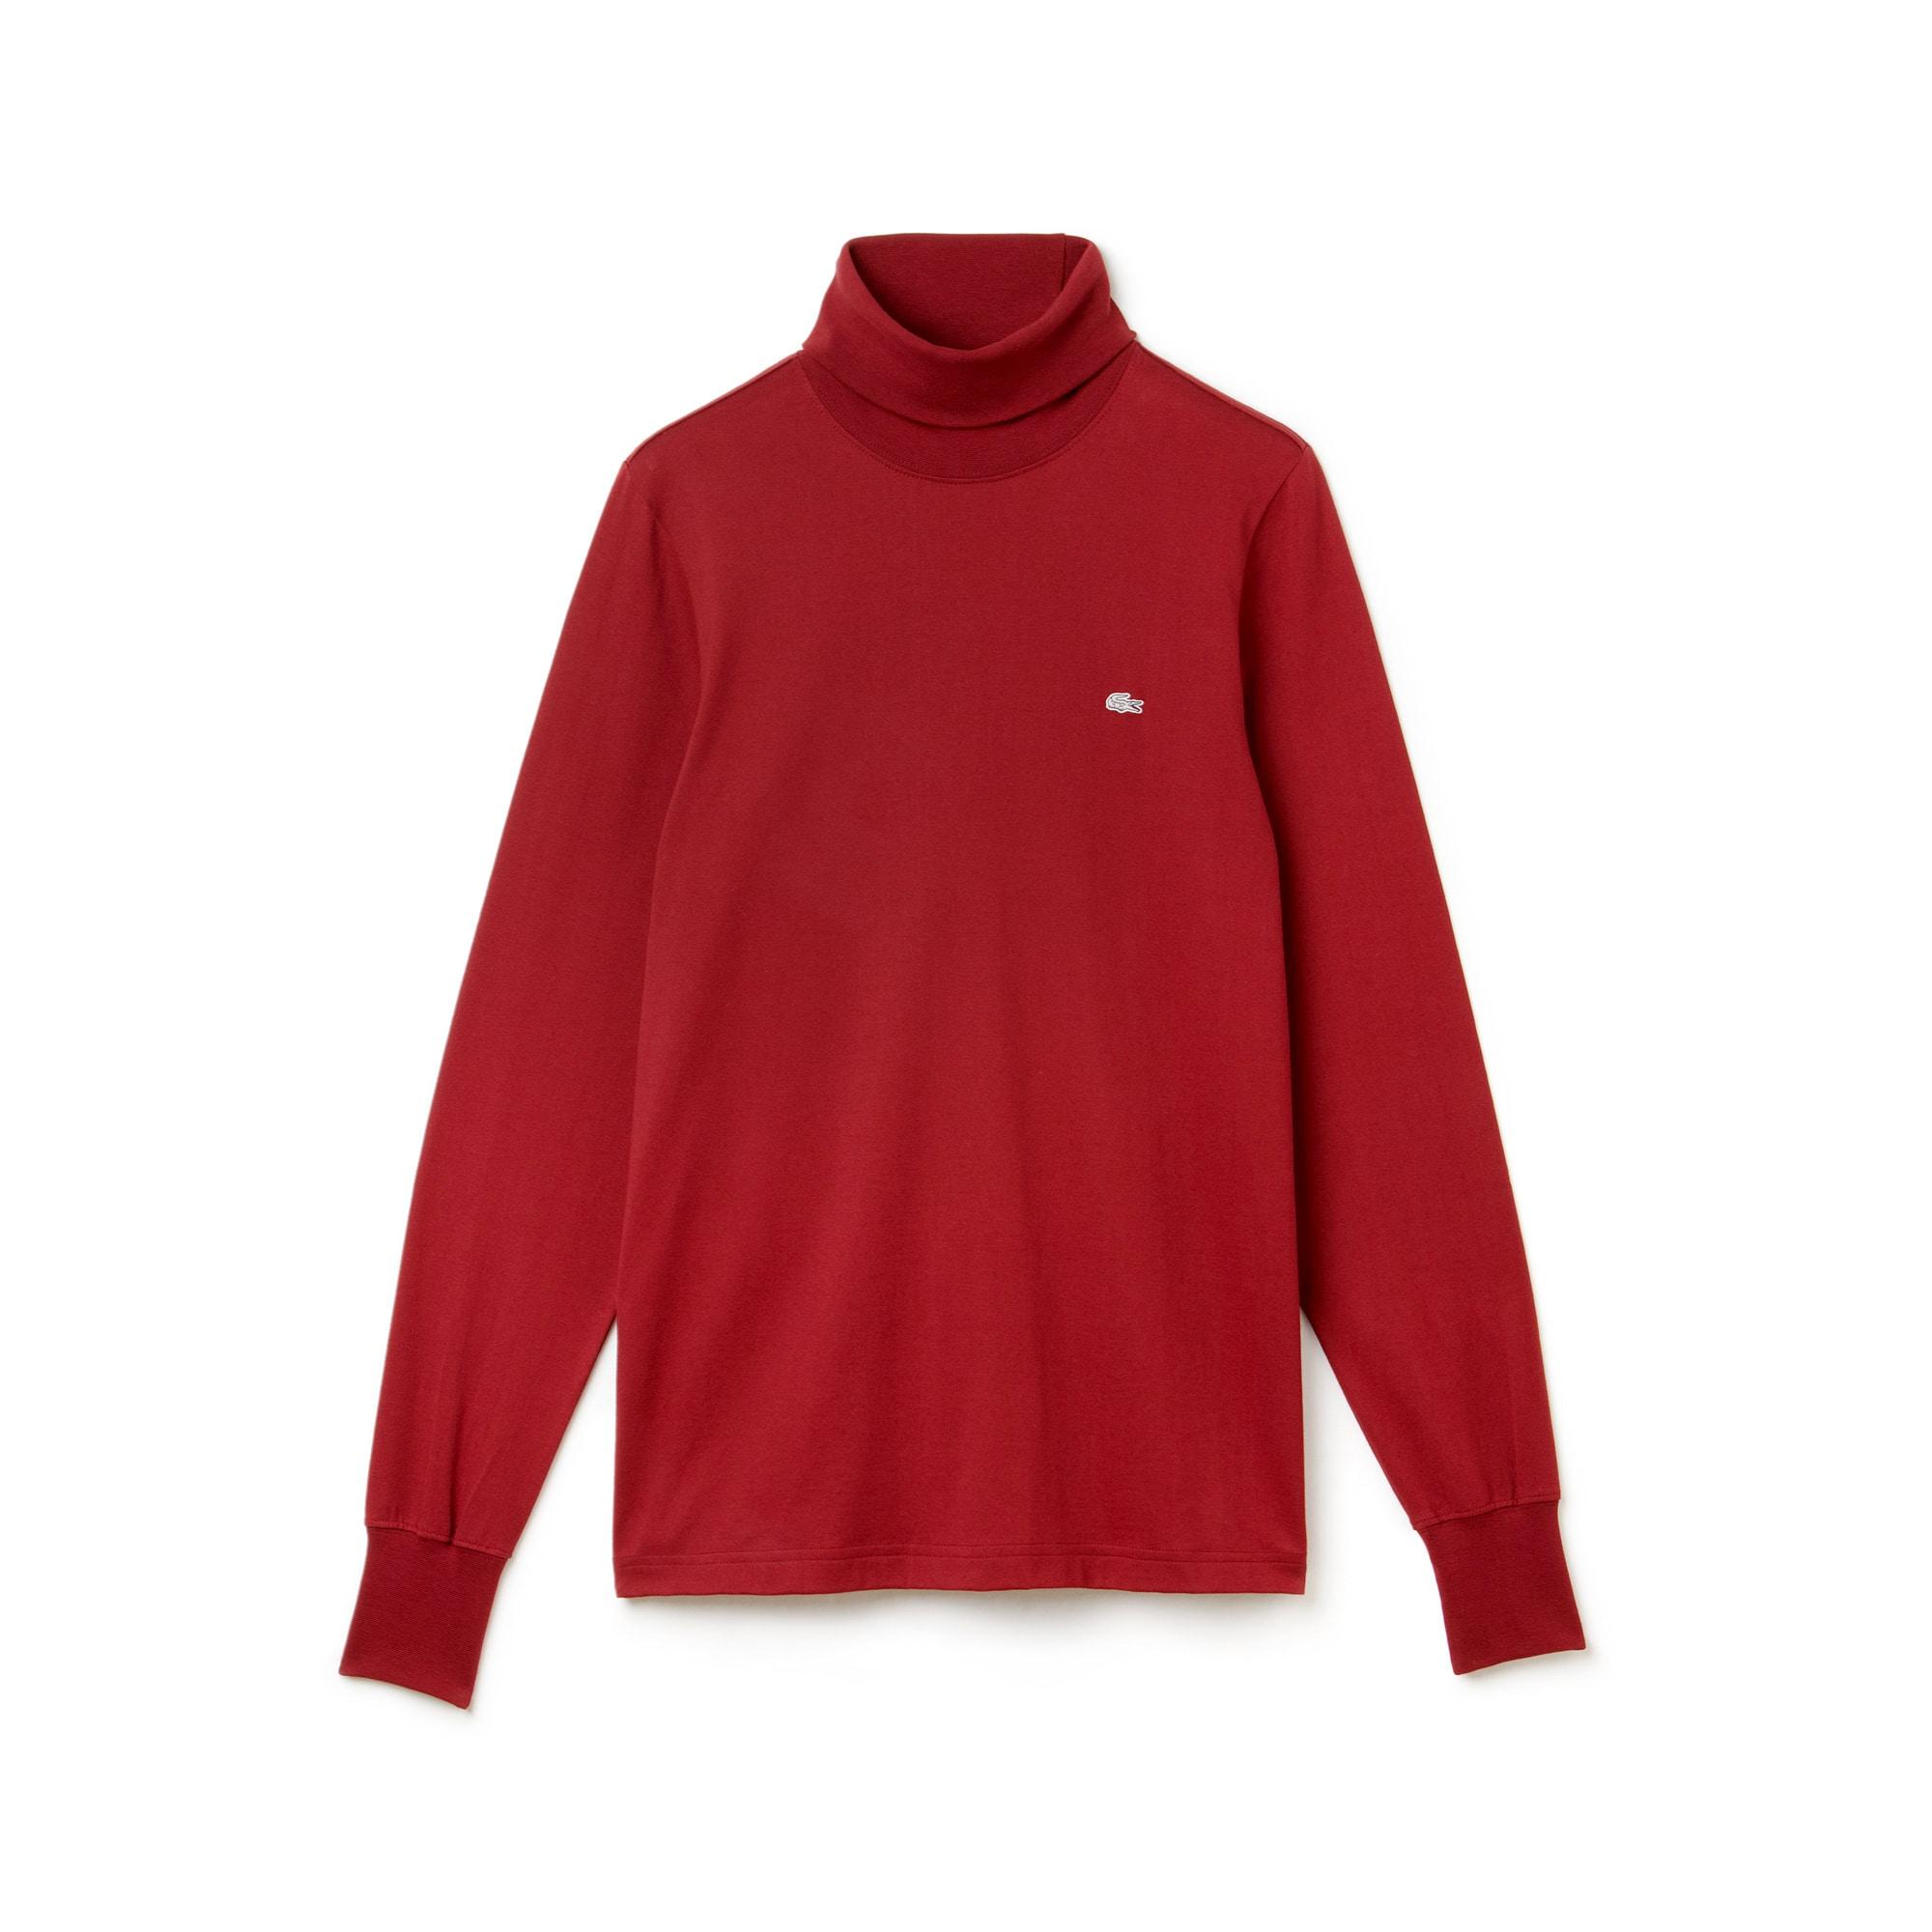 Men's Turtleneck Cotton Undershirt